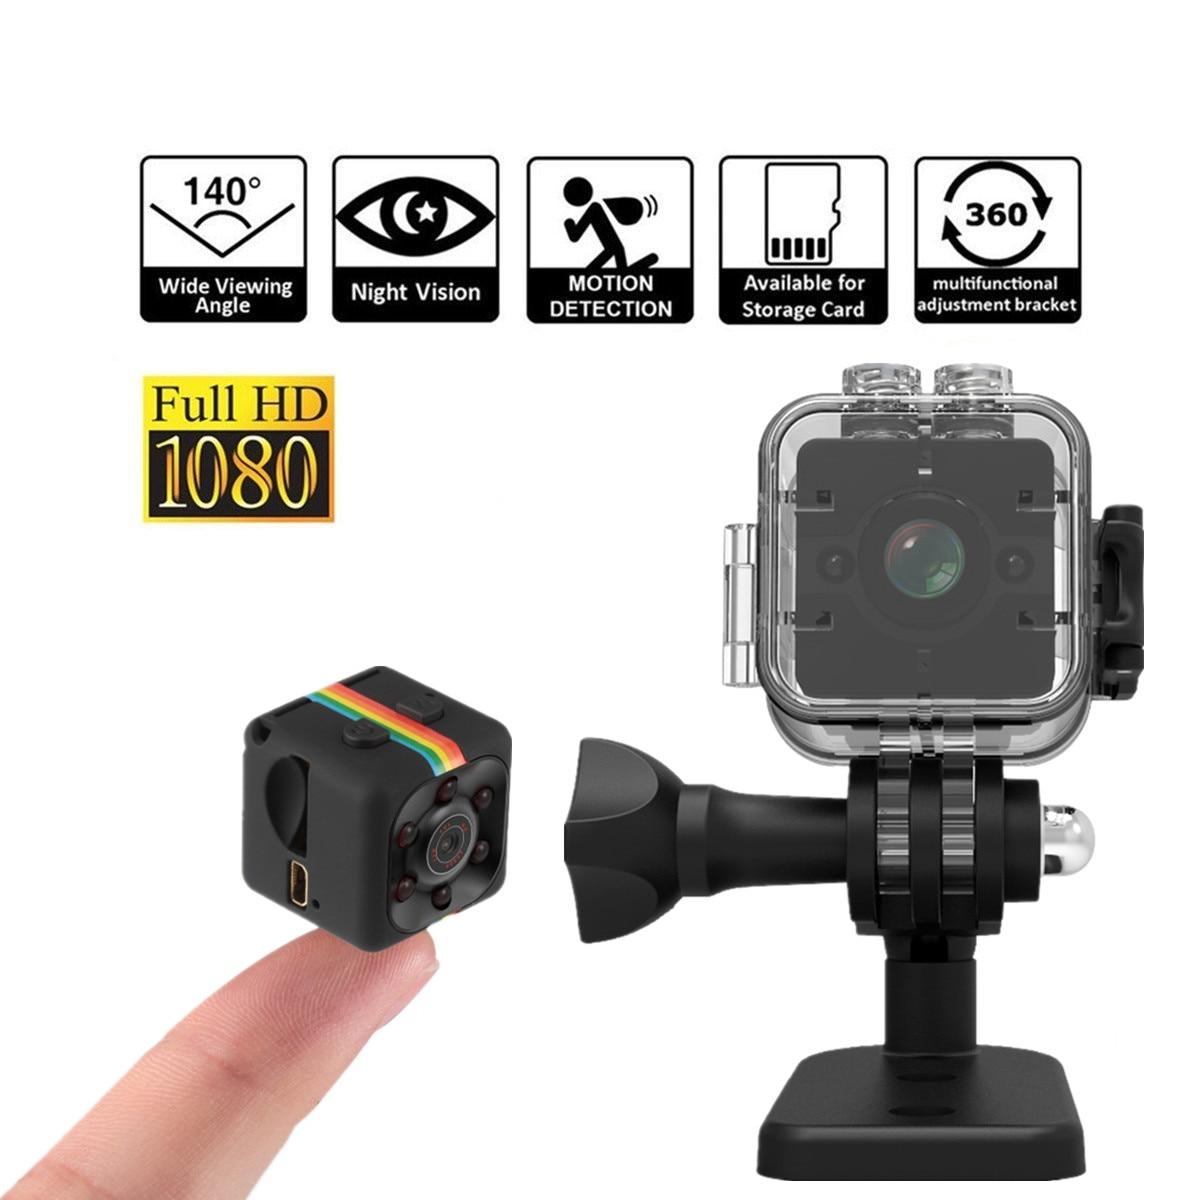 Mini Kamera SQ11 1080 P Full HD Micro Cam Bewegungserkennung Camcorder Infrarot-nachtsicht Video Recorder Weitwinkel sq12 SQ 11